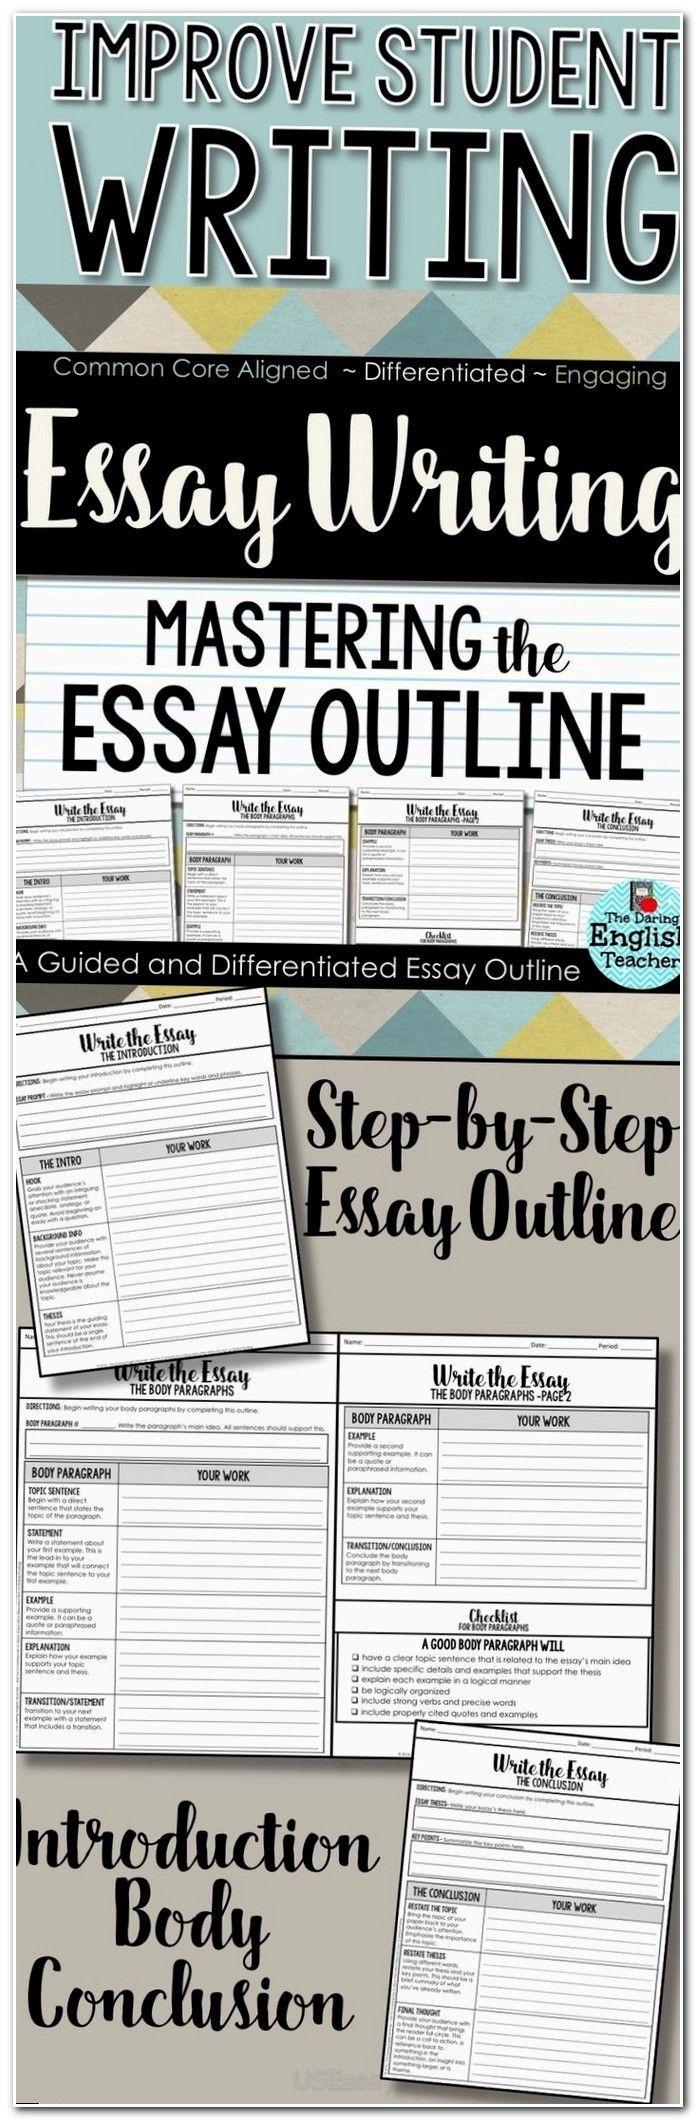 Home - Good Essay Writing Service